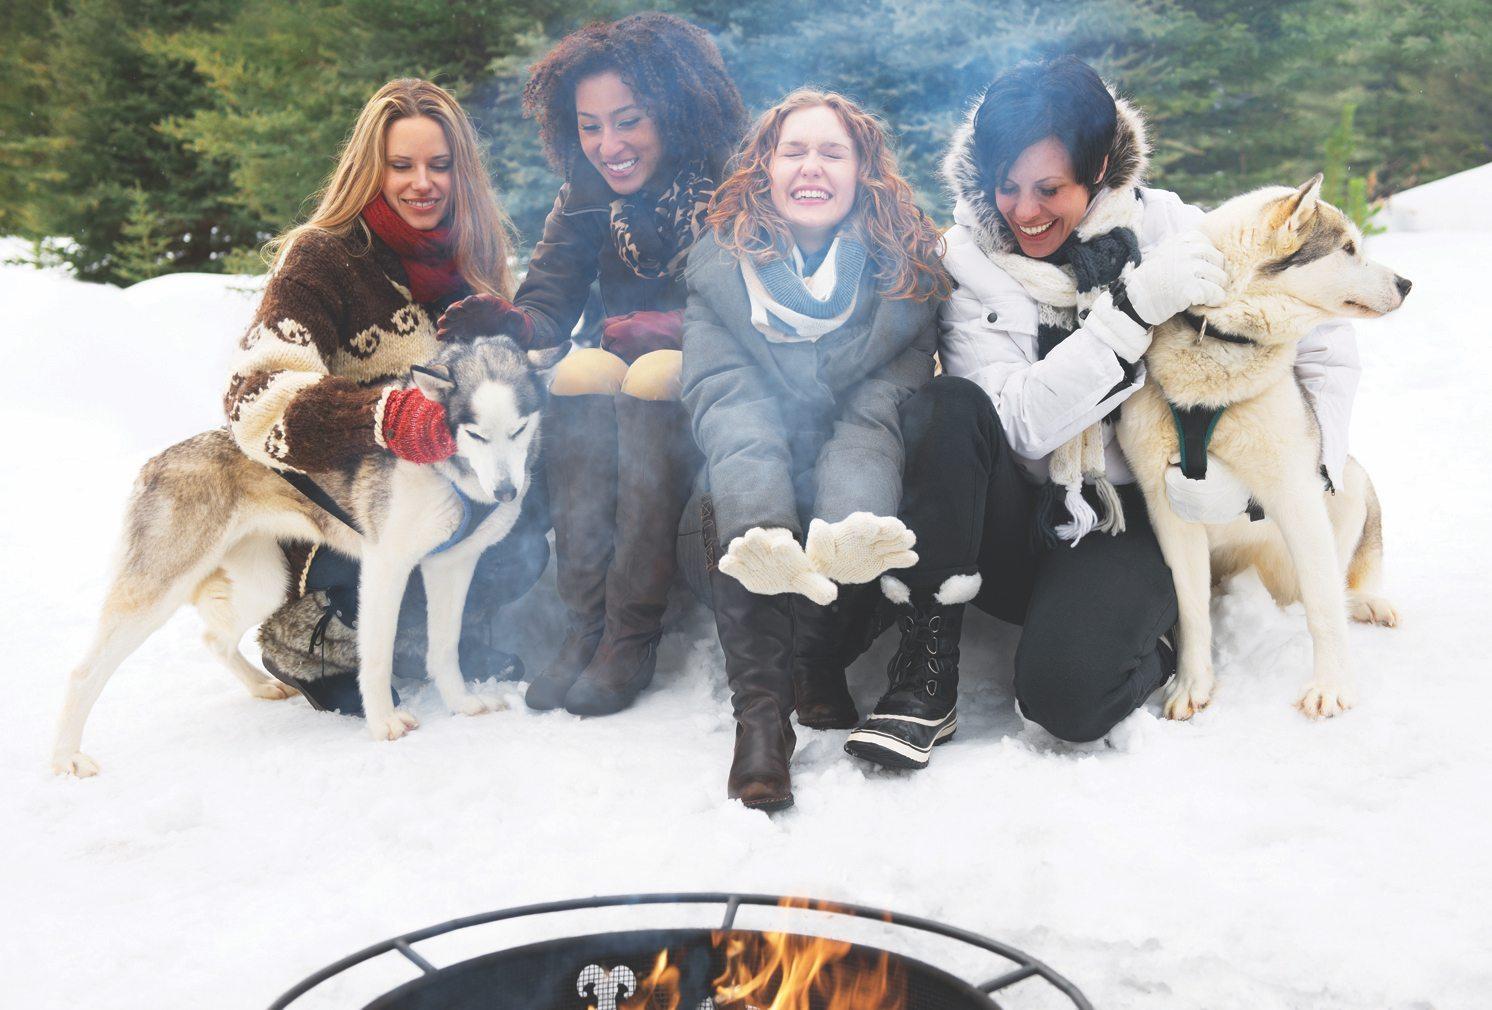 Dogsled Tour in Spray Lakes, Alberta